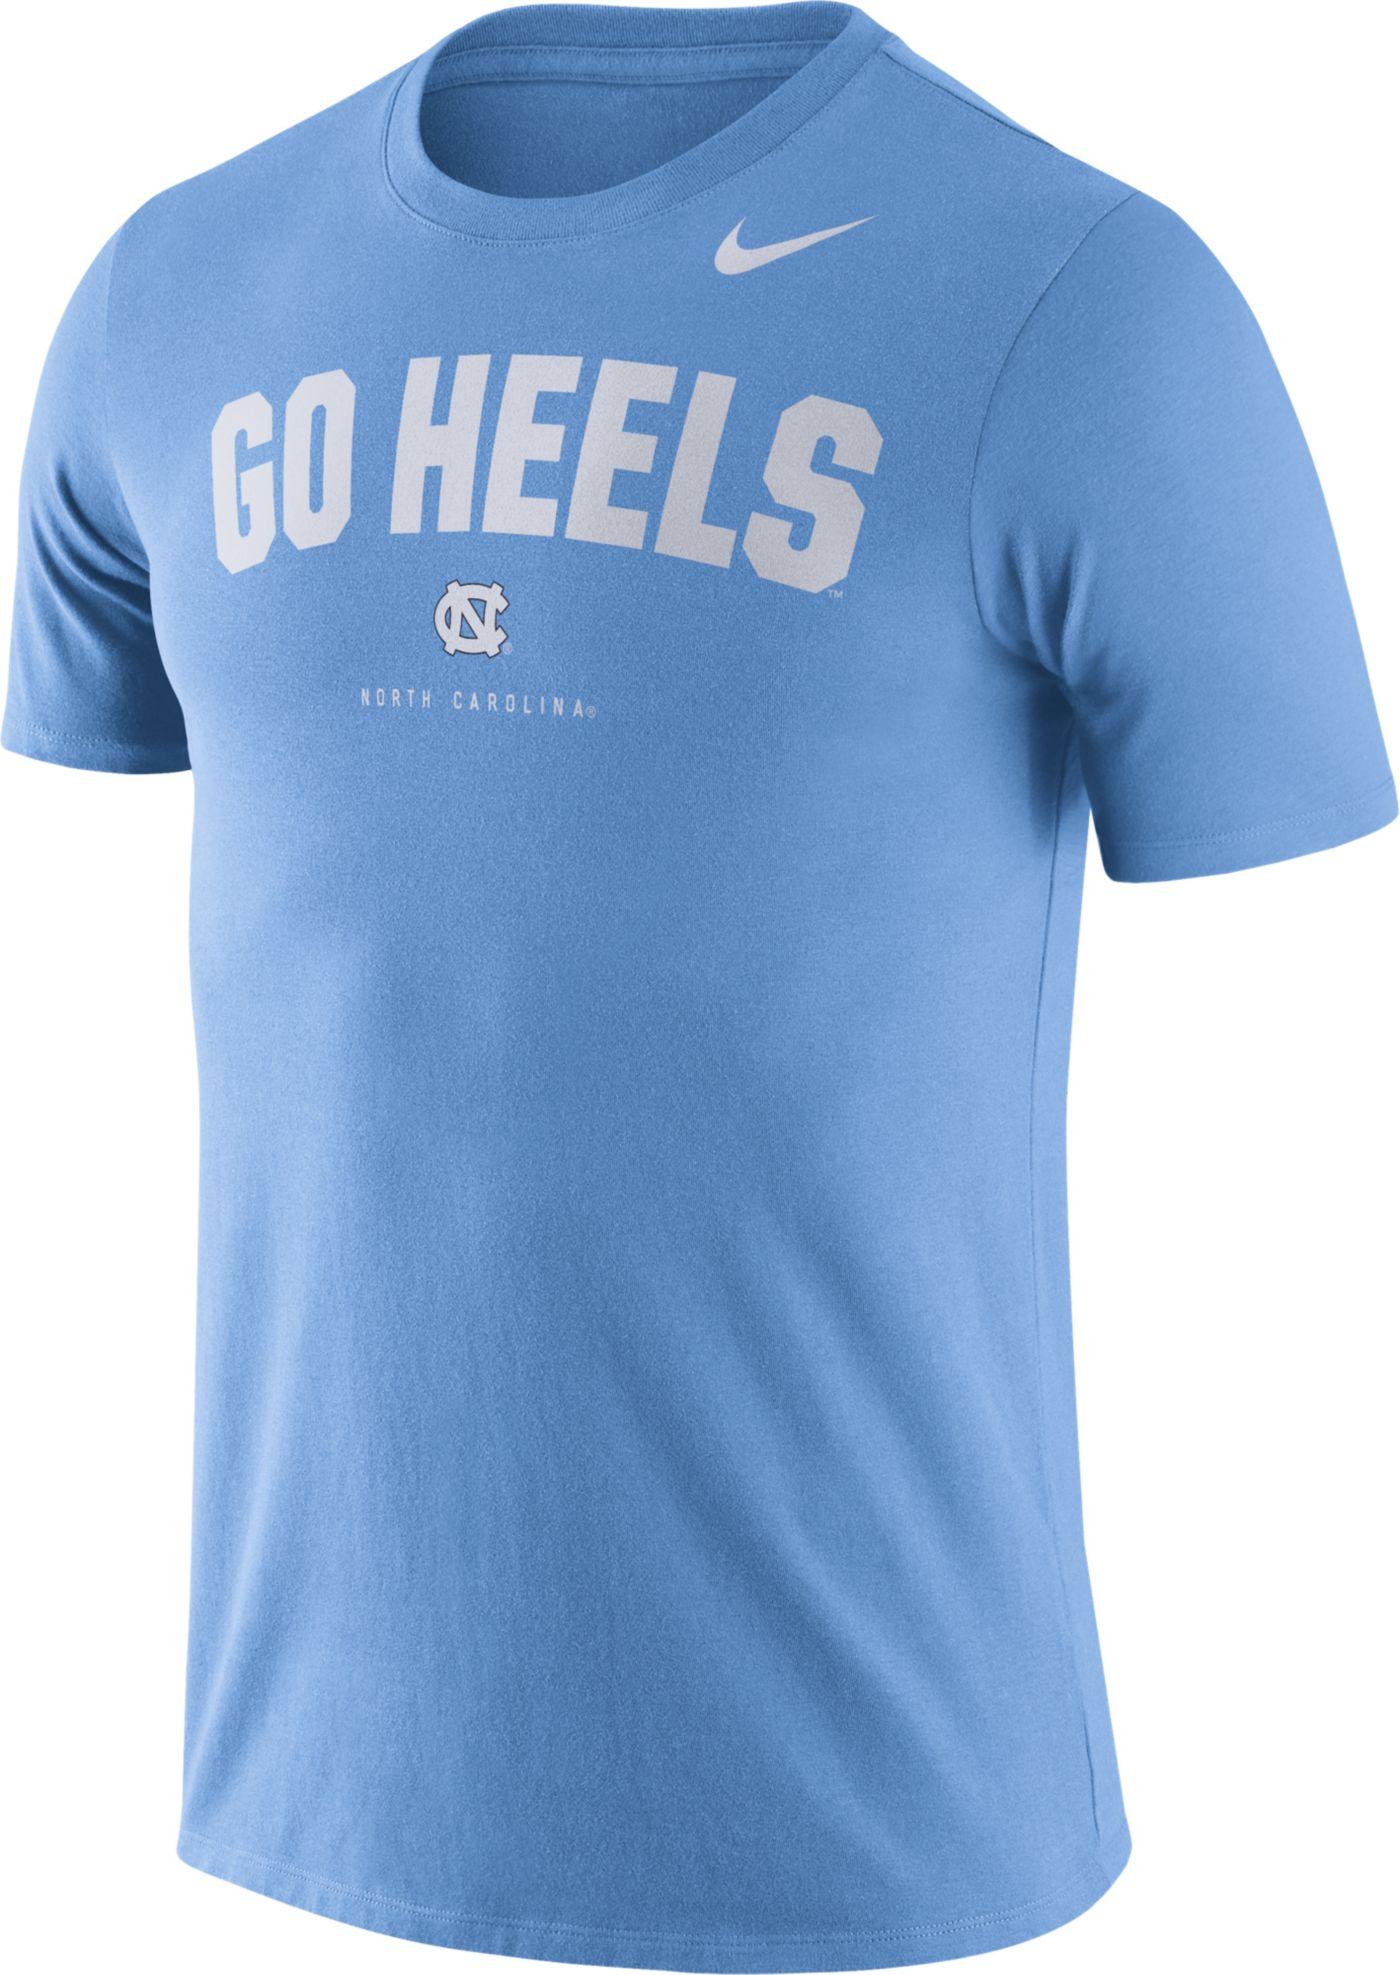 Nike Men's North Carolina Tar Heels Carolina Blue Dri-FIT Phrase T-Shirt